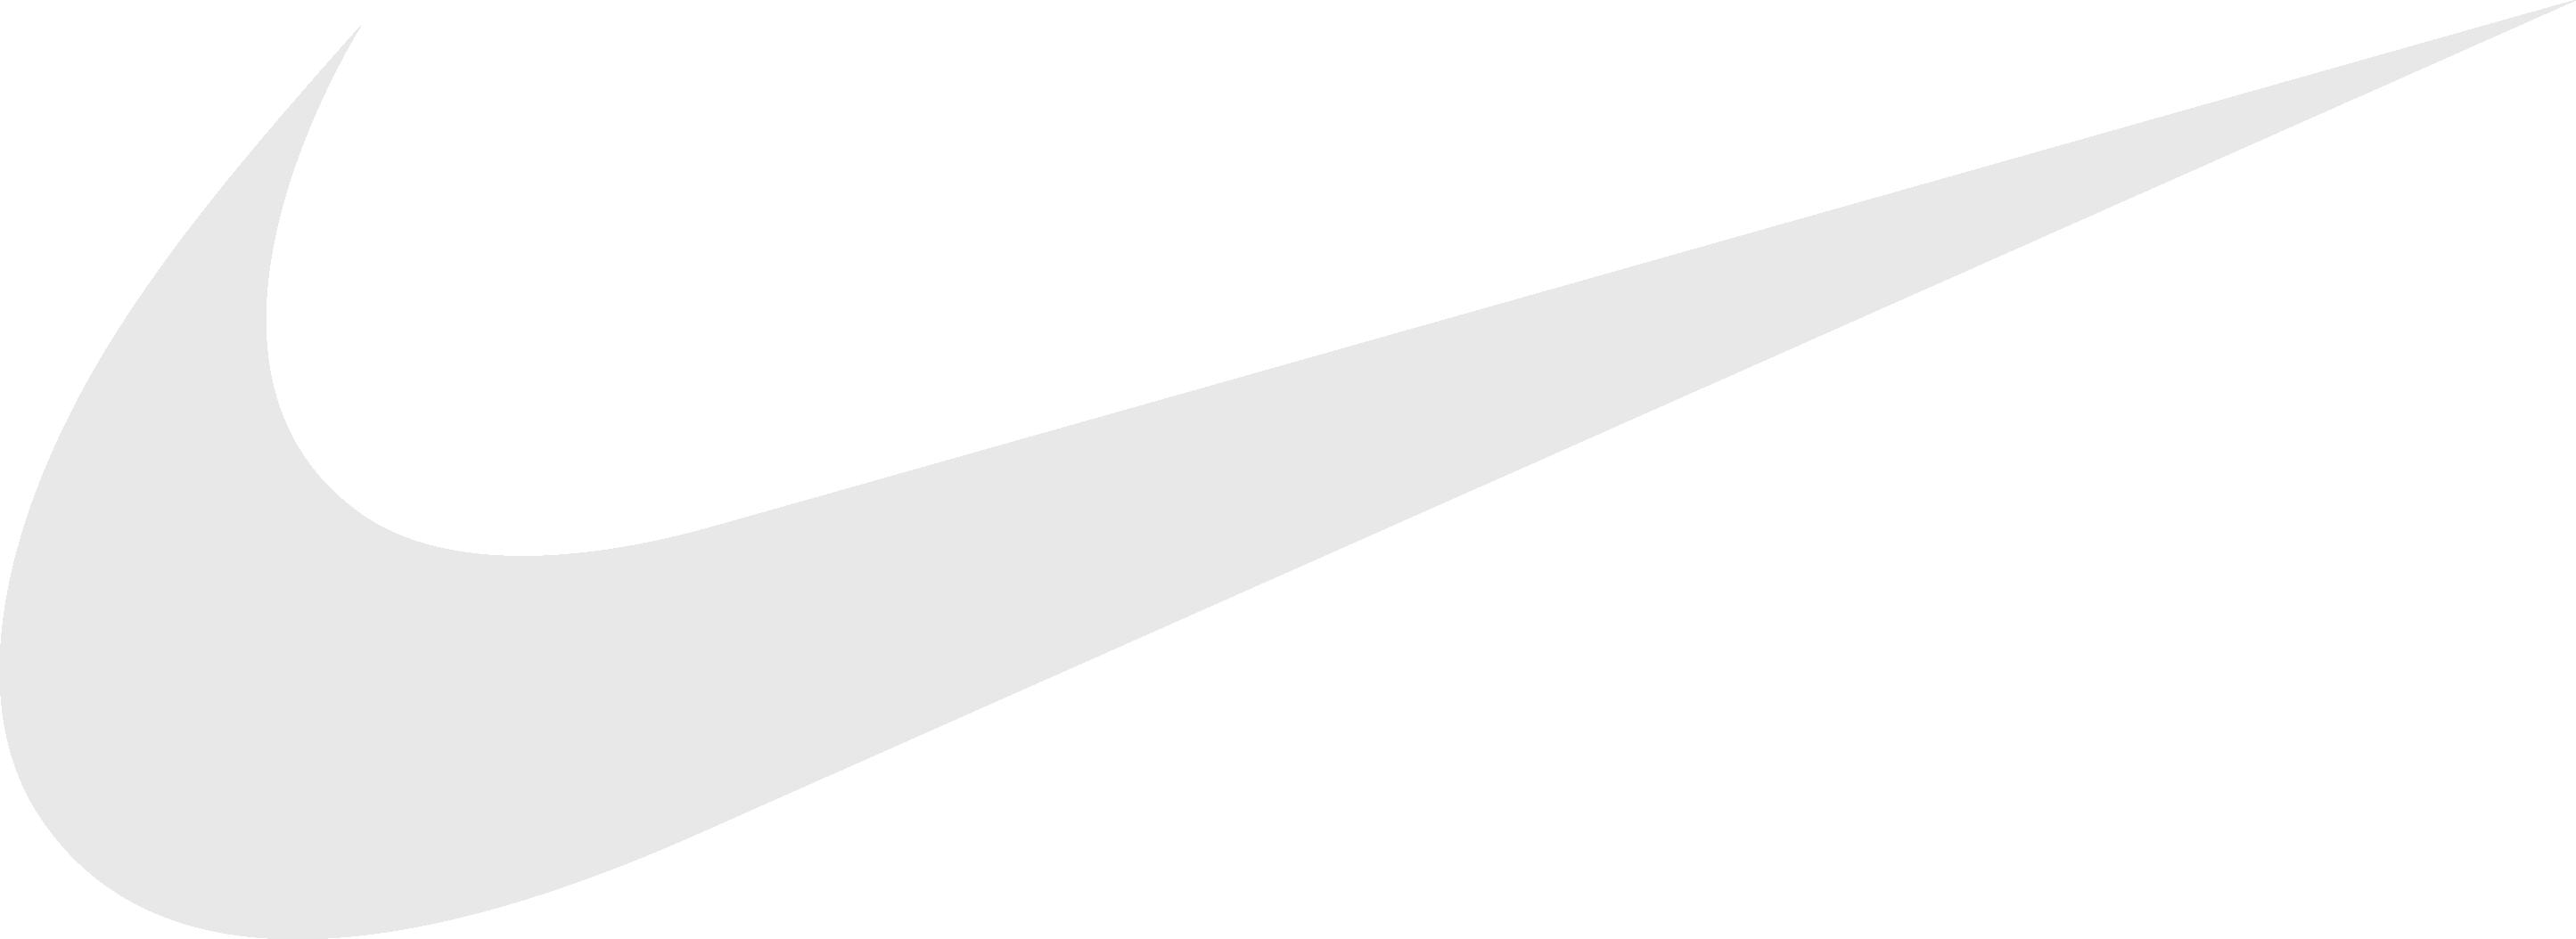 Nike Unite Logo